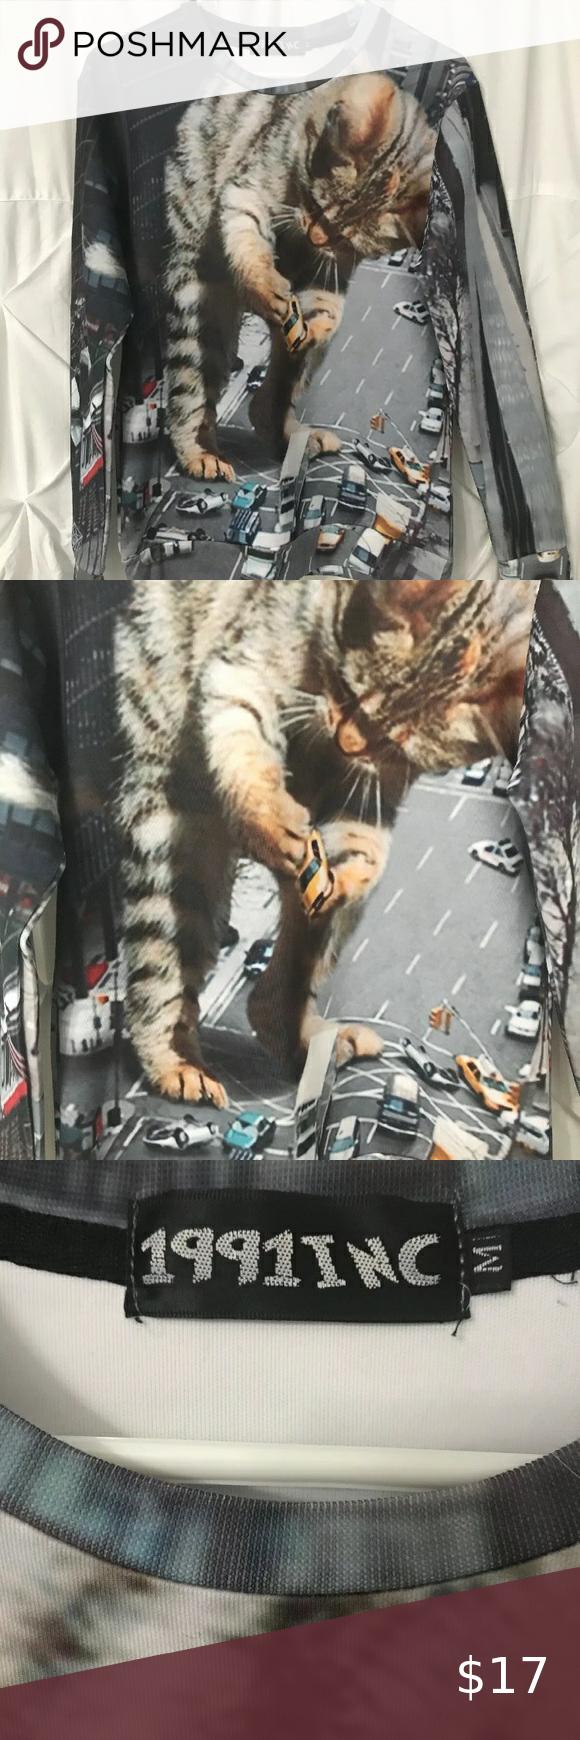 Weird Giant Cat Sweatshirt 1991 Inc Euc Mens Cat Shirt 1991 Inc Giant Cat Takes Over City Sweatshirt Size M Rare Cat Sweatshirt Nfl Outfits Tech Fleece Hoodie [ 1740 x 580 Pixel ]